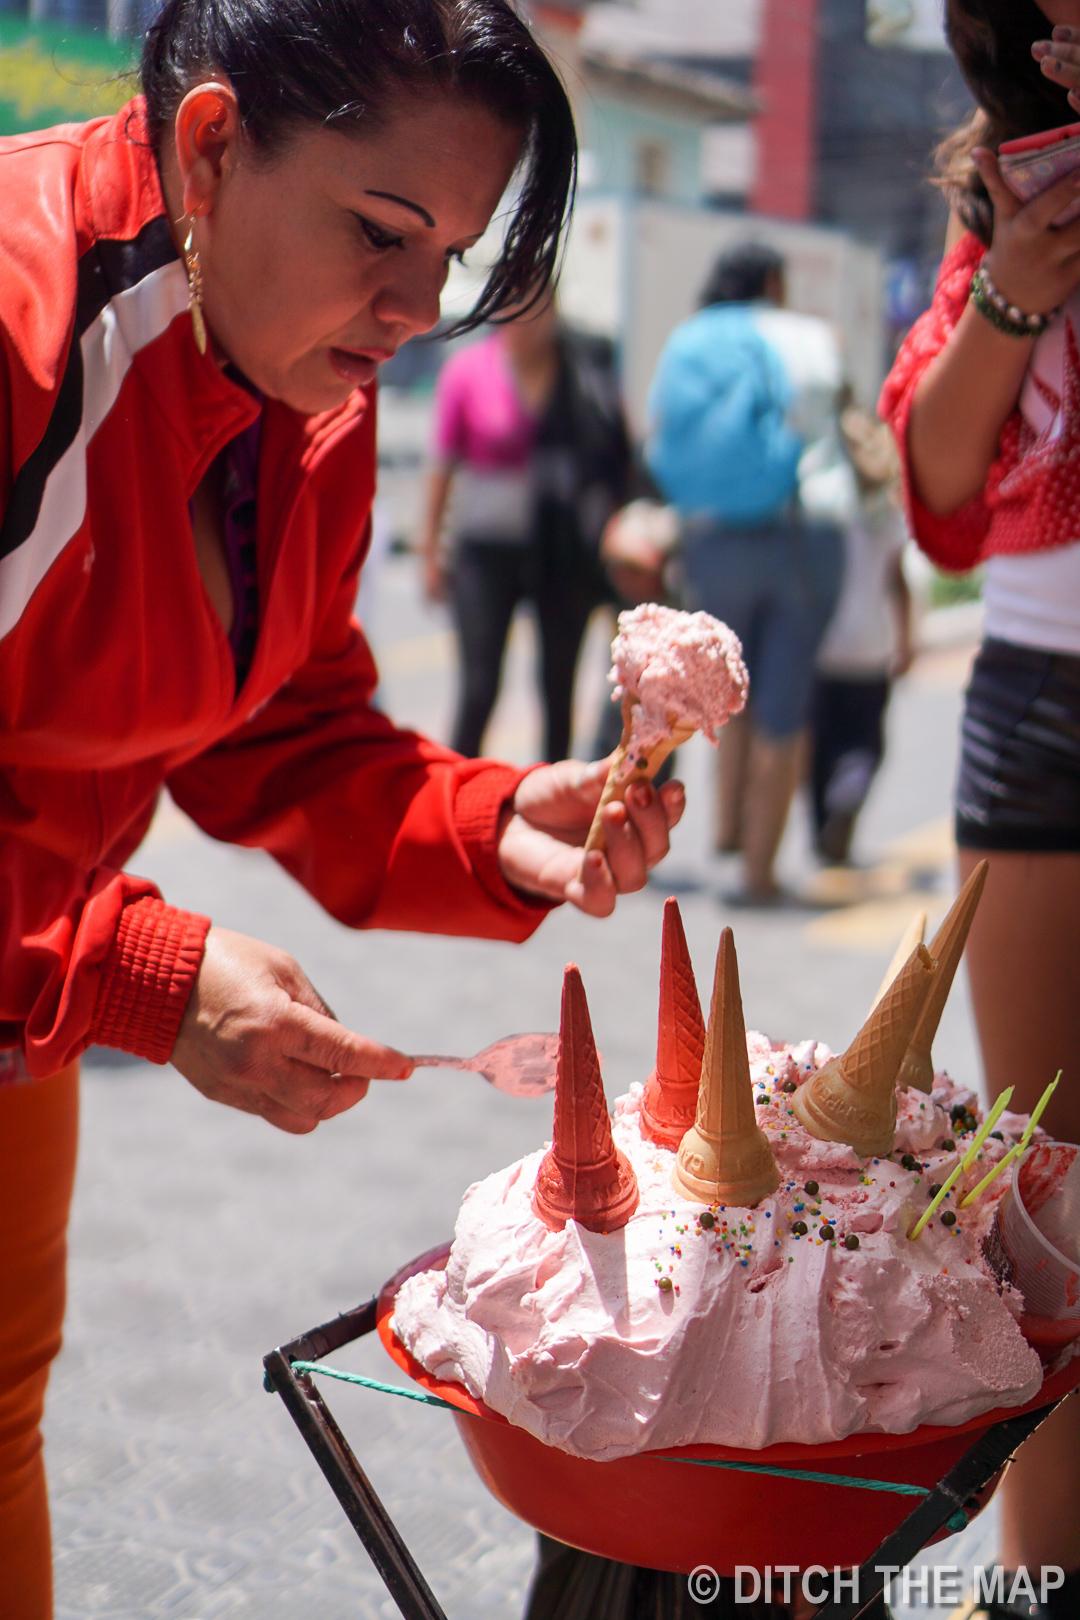 Trying a Strawberry Marshmallow-Fluff like Dessert in Otavalo, Ecuador